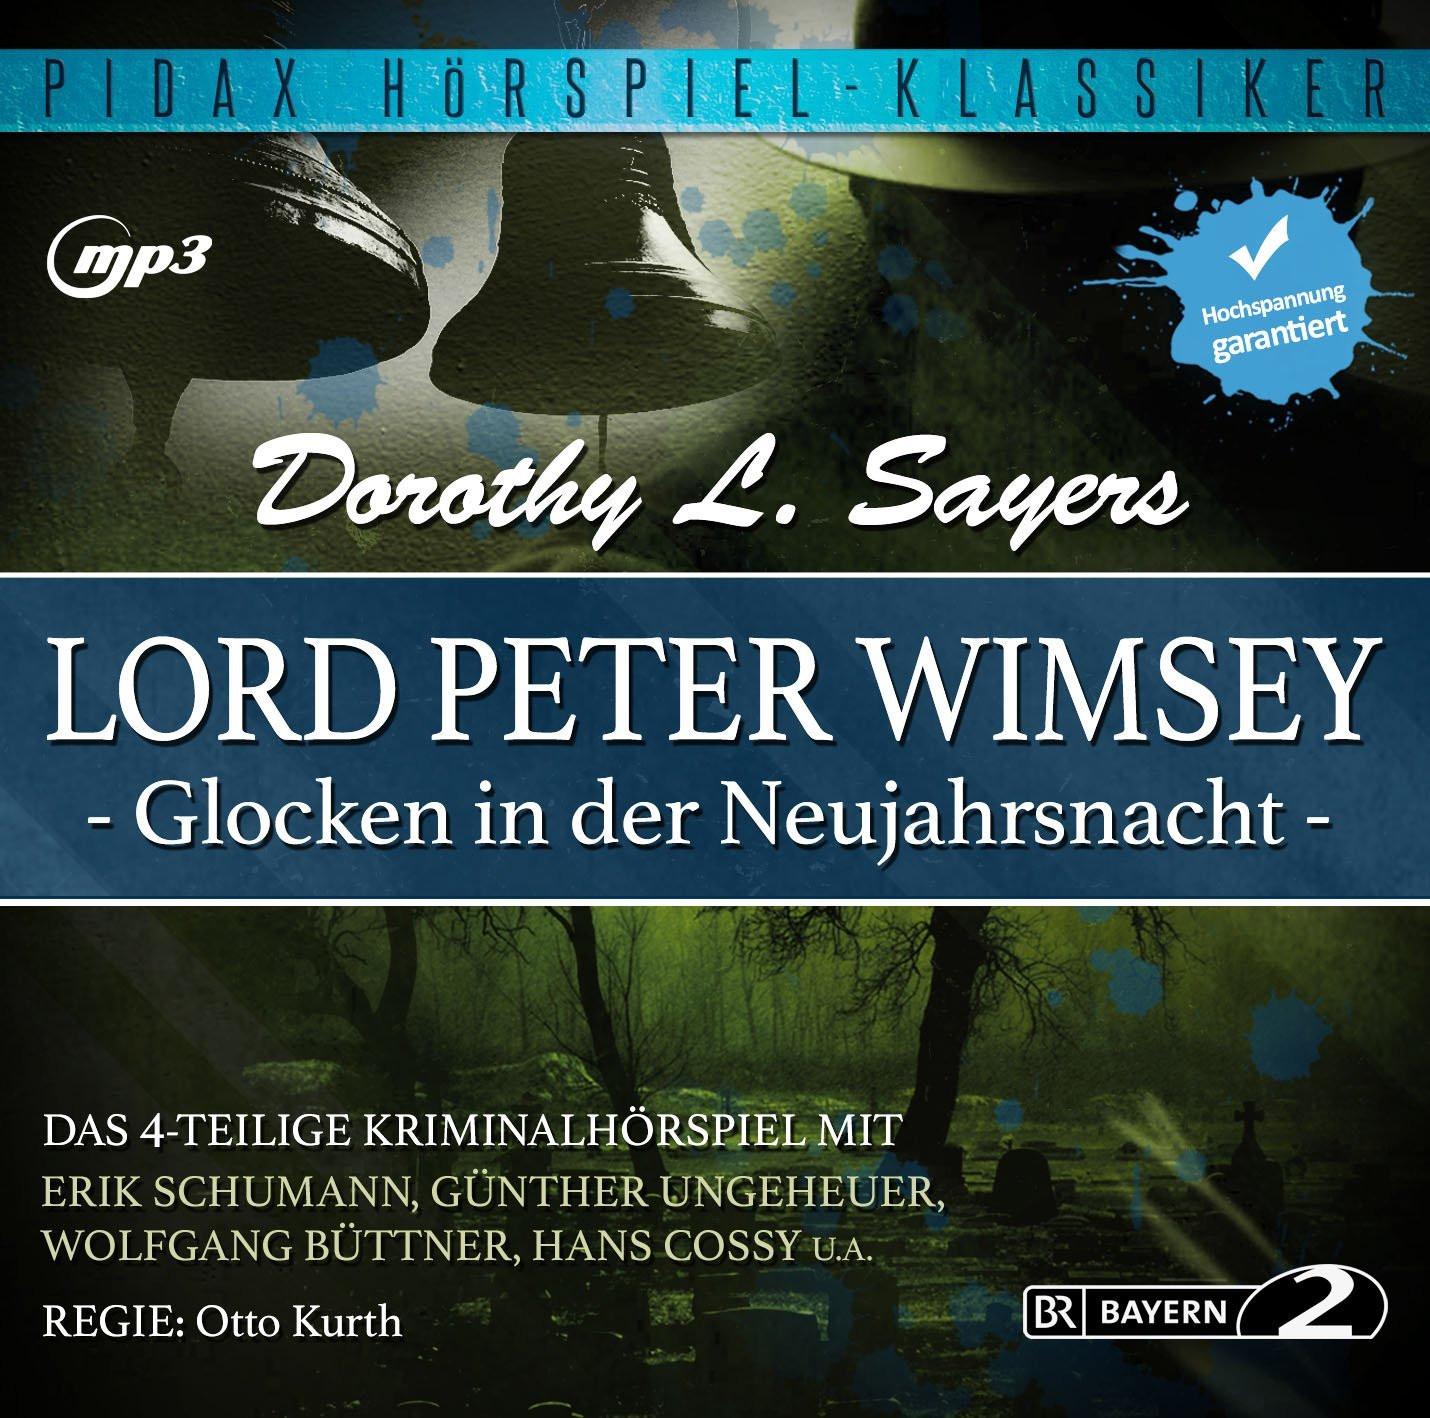 Pidax Hörspiel Klassiker - Lord Peter Wimsey - Glocken in der Ne